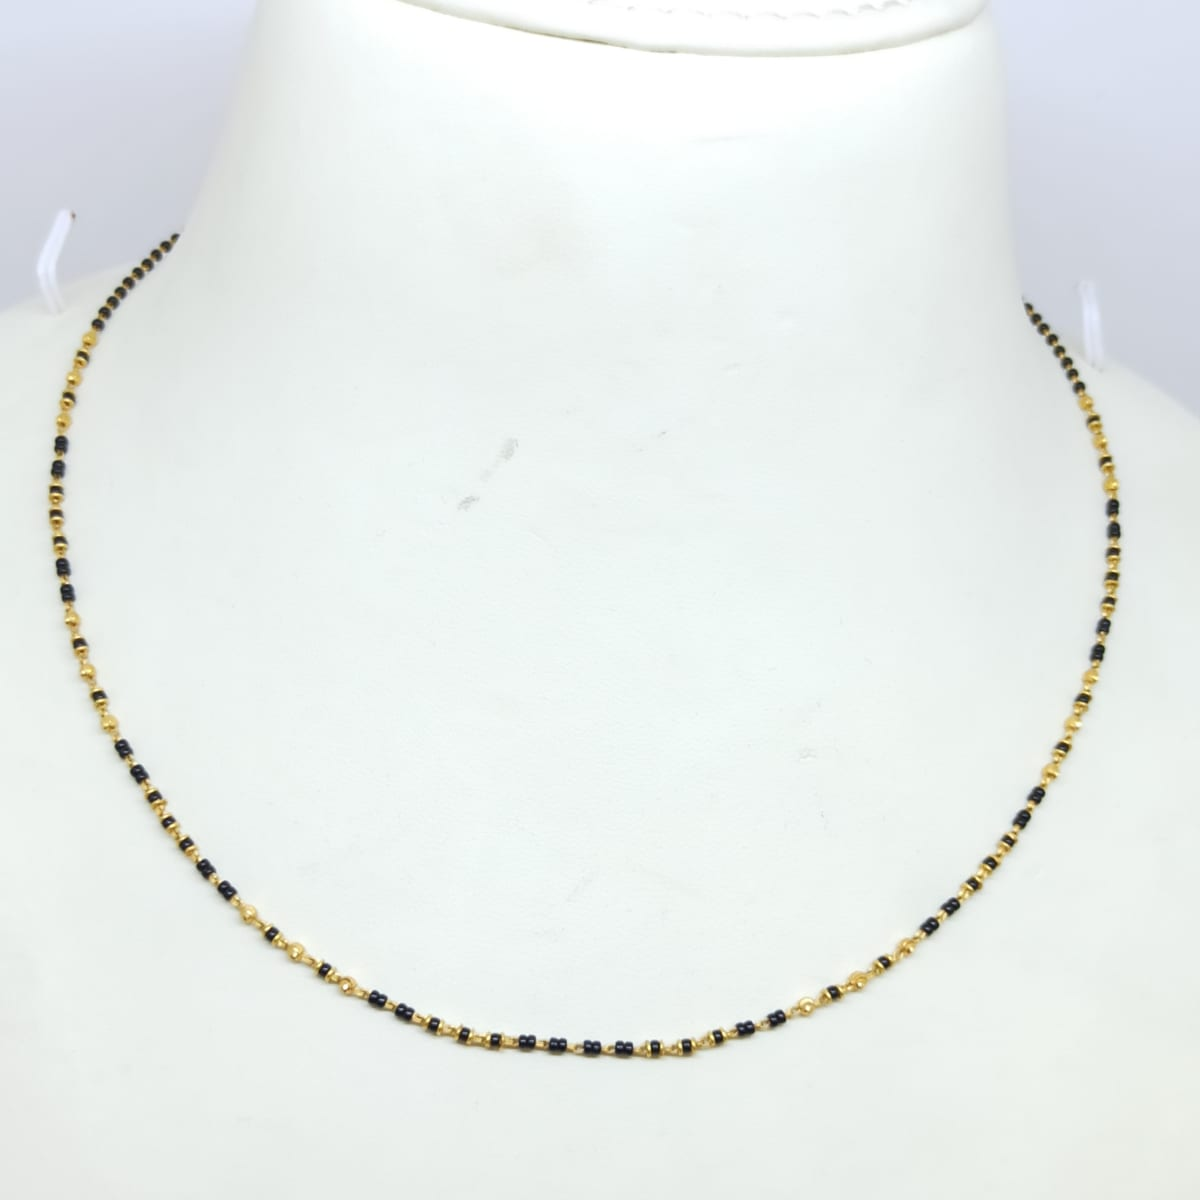 Black Bead Mangalsutra Chain